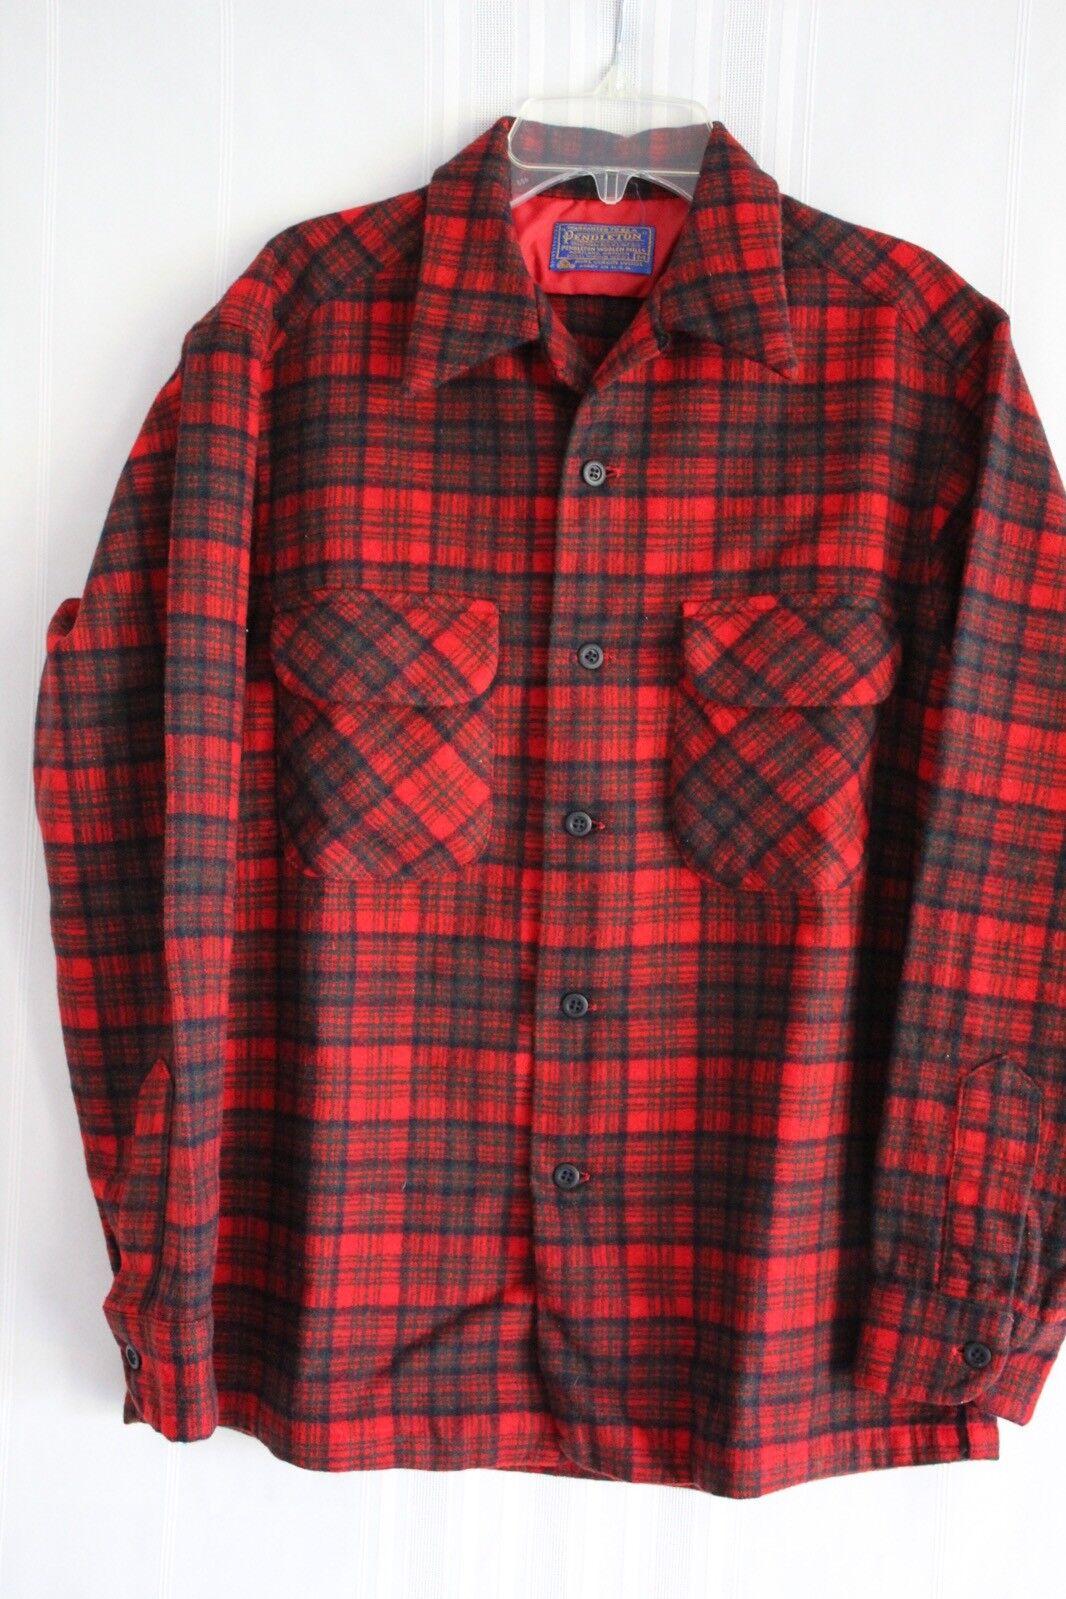 Vintage Pendleton Men's Plaid Loop Collar 100% Virgin Wool Board Shirt size M